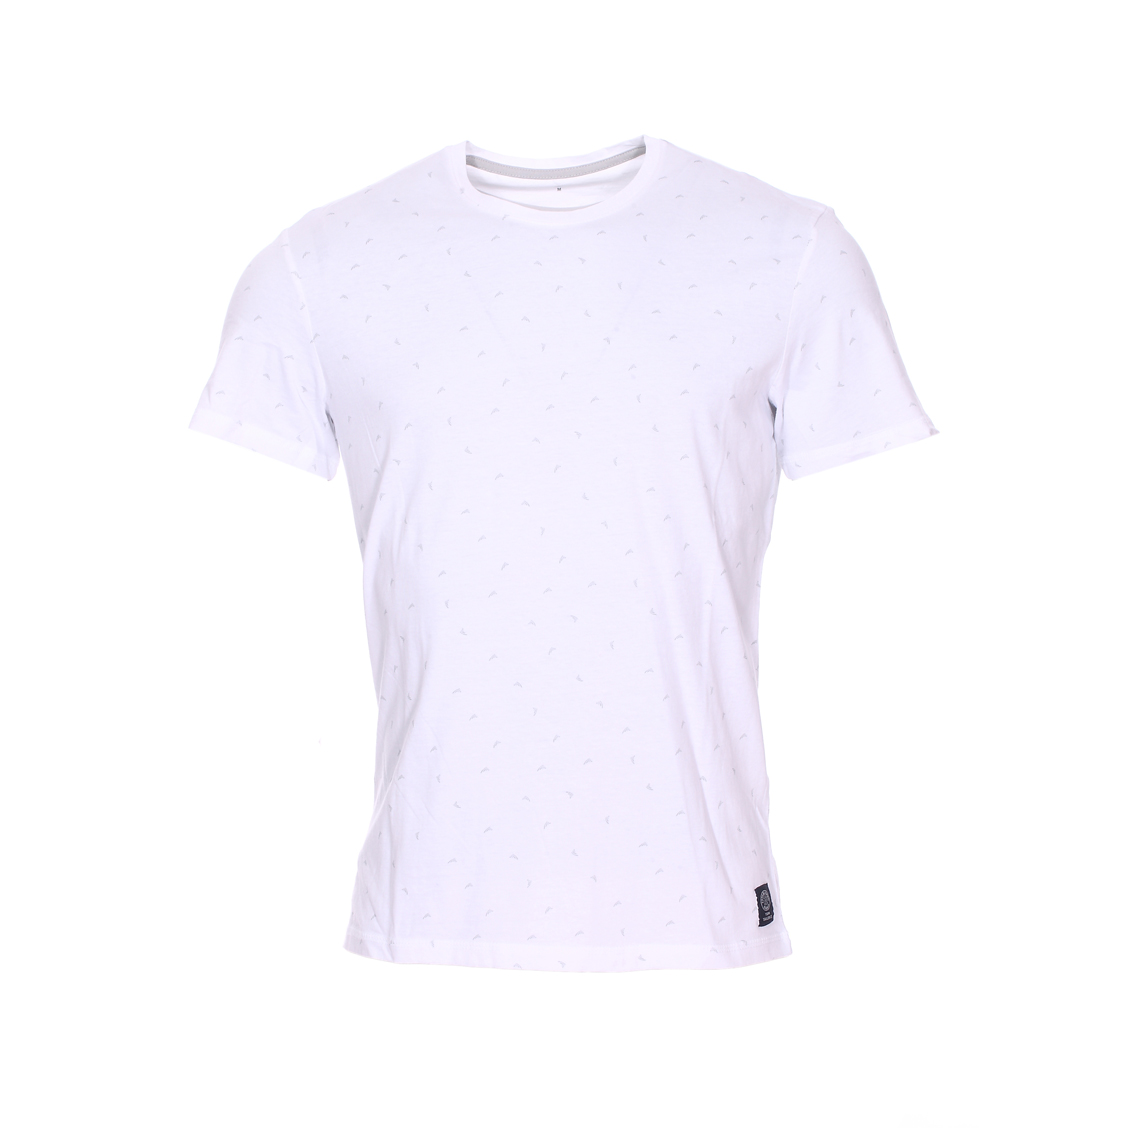 Tee-shirt col rond  blanc à motifs gris